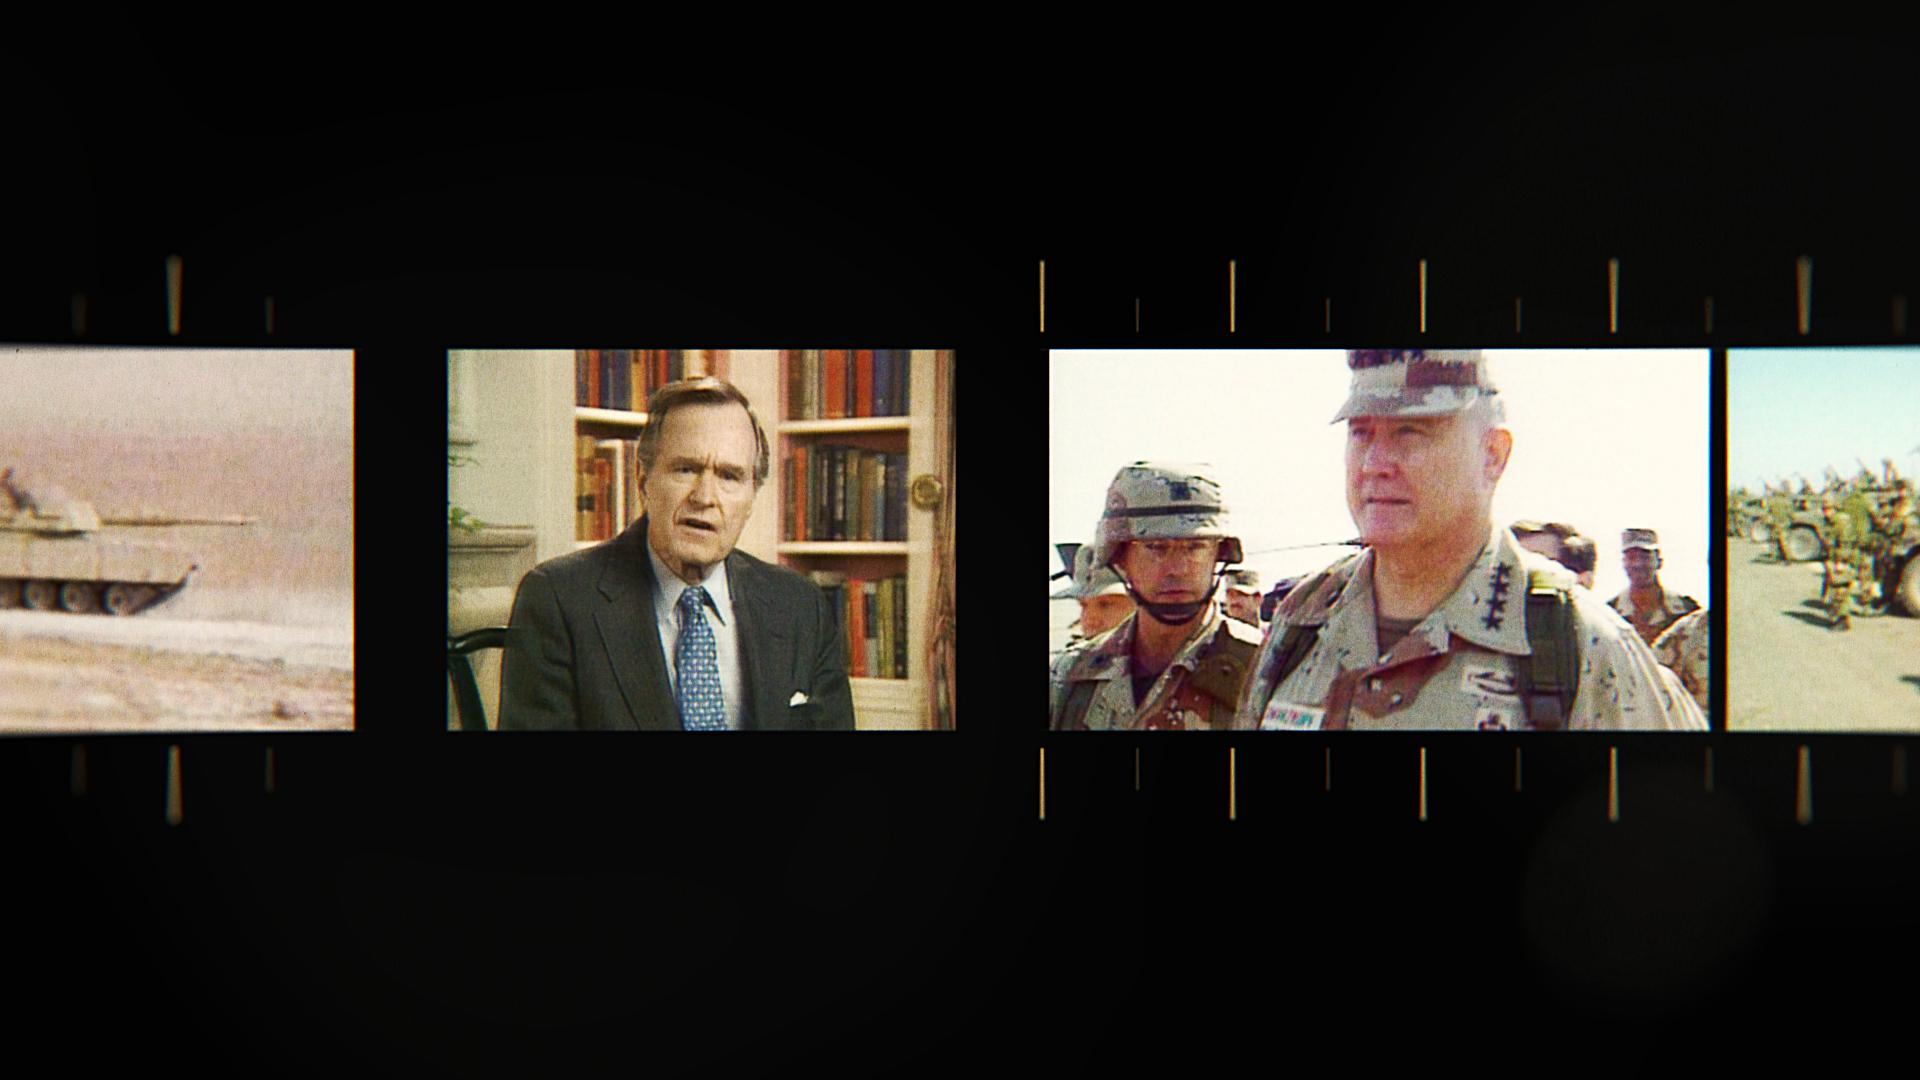 01_EXP_Wormhole-Iraq_FINAL_ProRes4444 (0-00-16-01).jpg